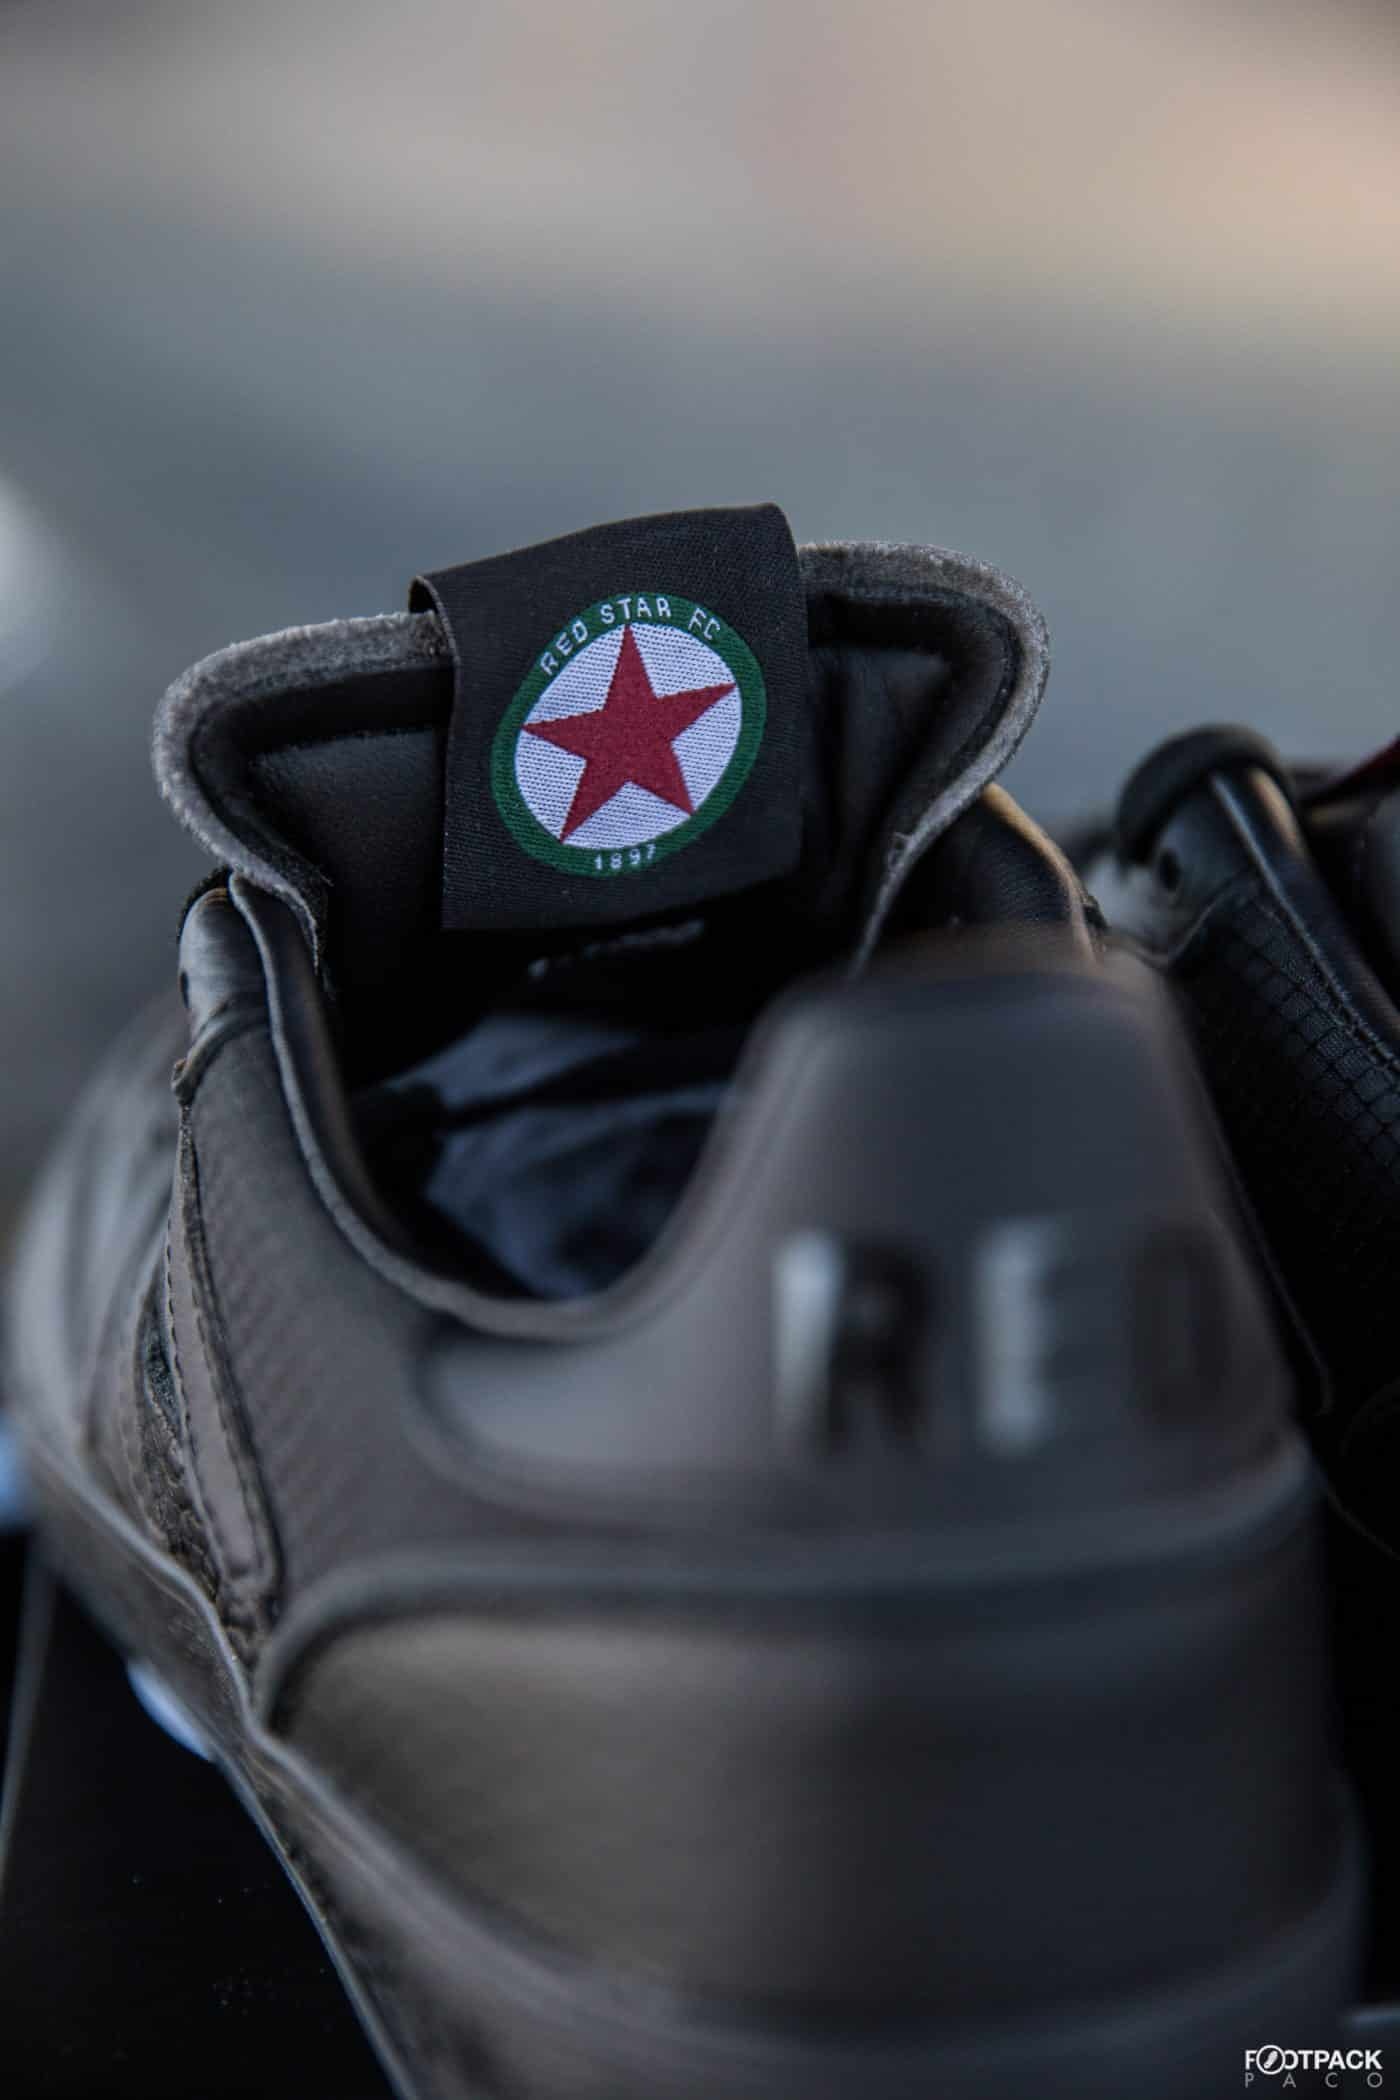 adidas-sobakov-red-star-footpack-13